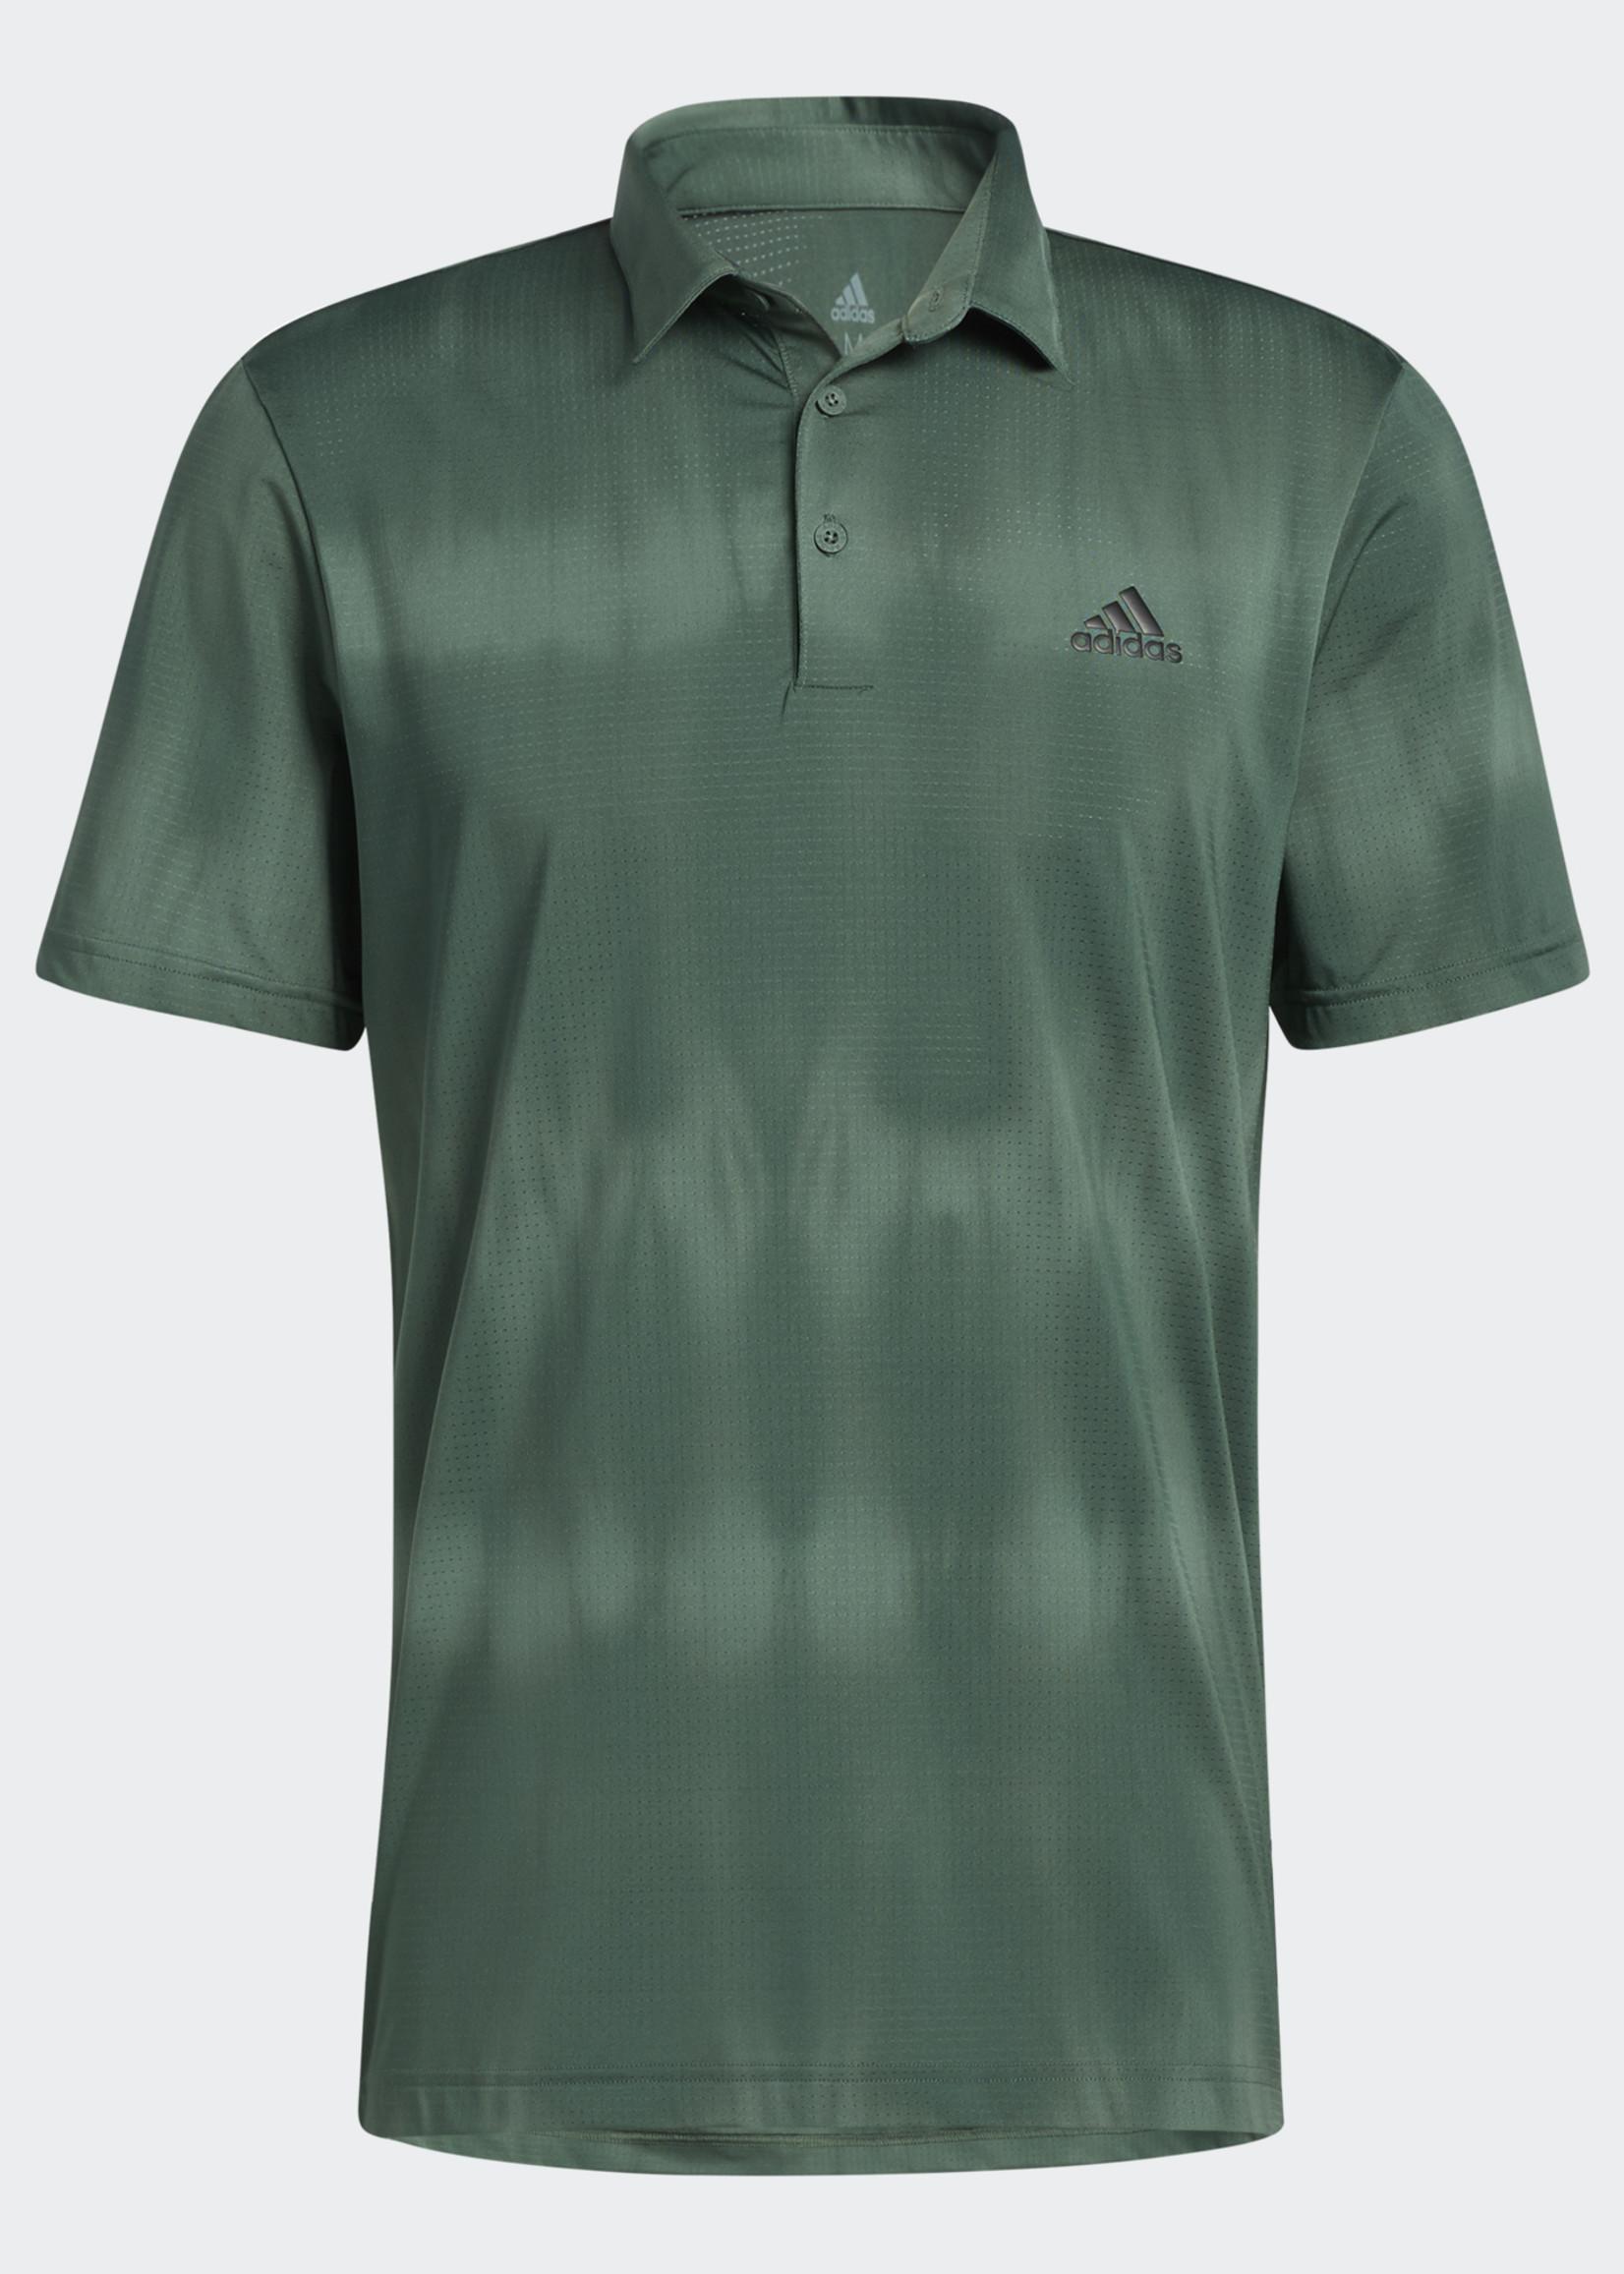 Adidas NVLTY DYE POLO      GREOXI/GREFOU